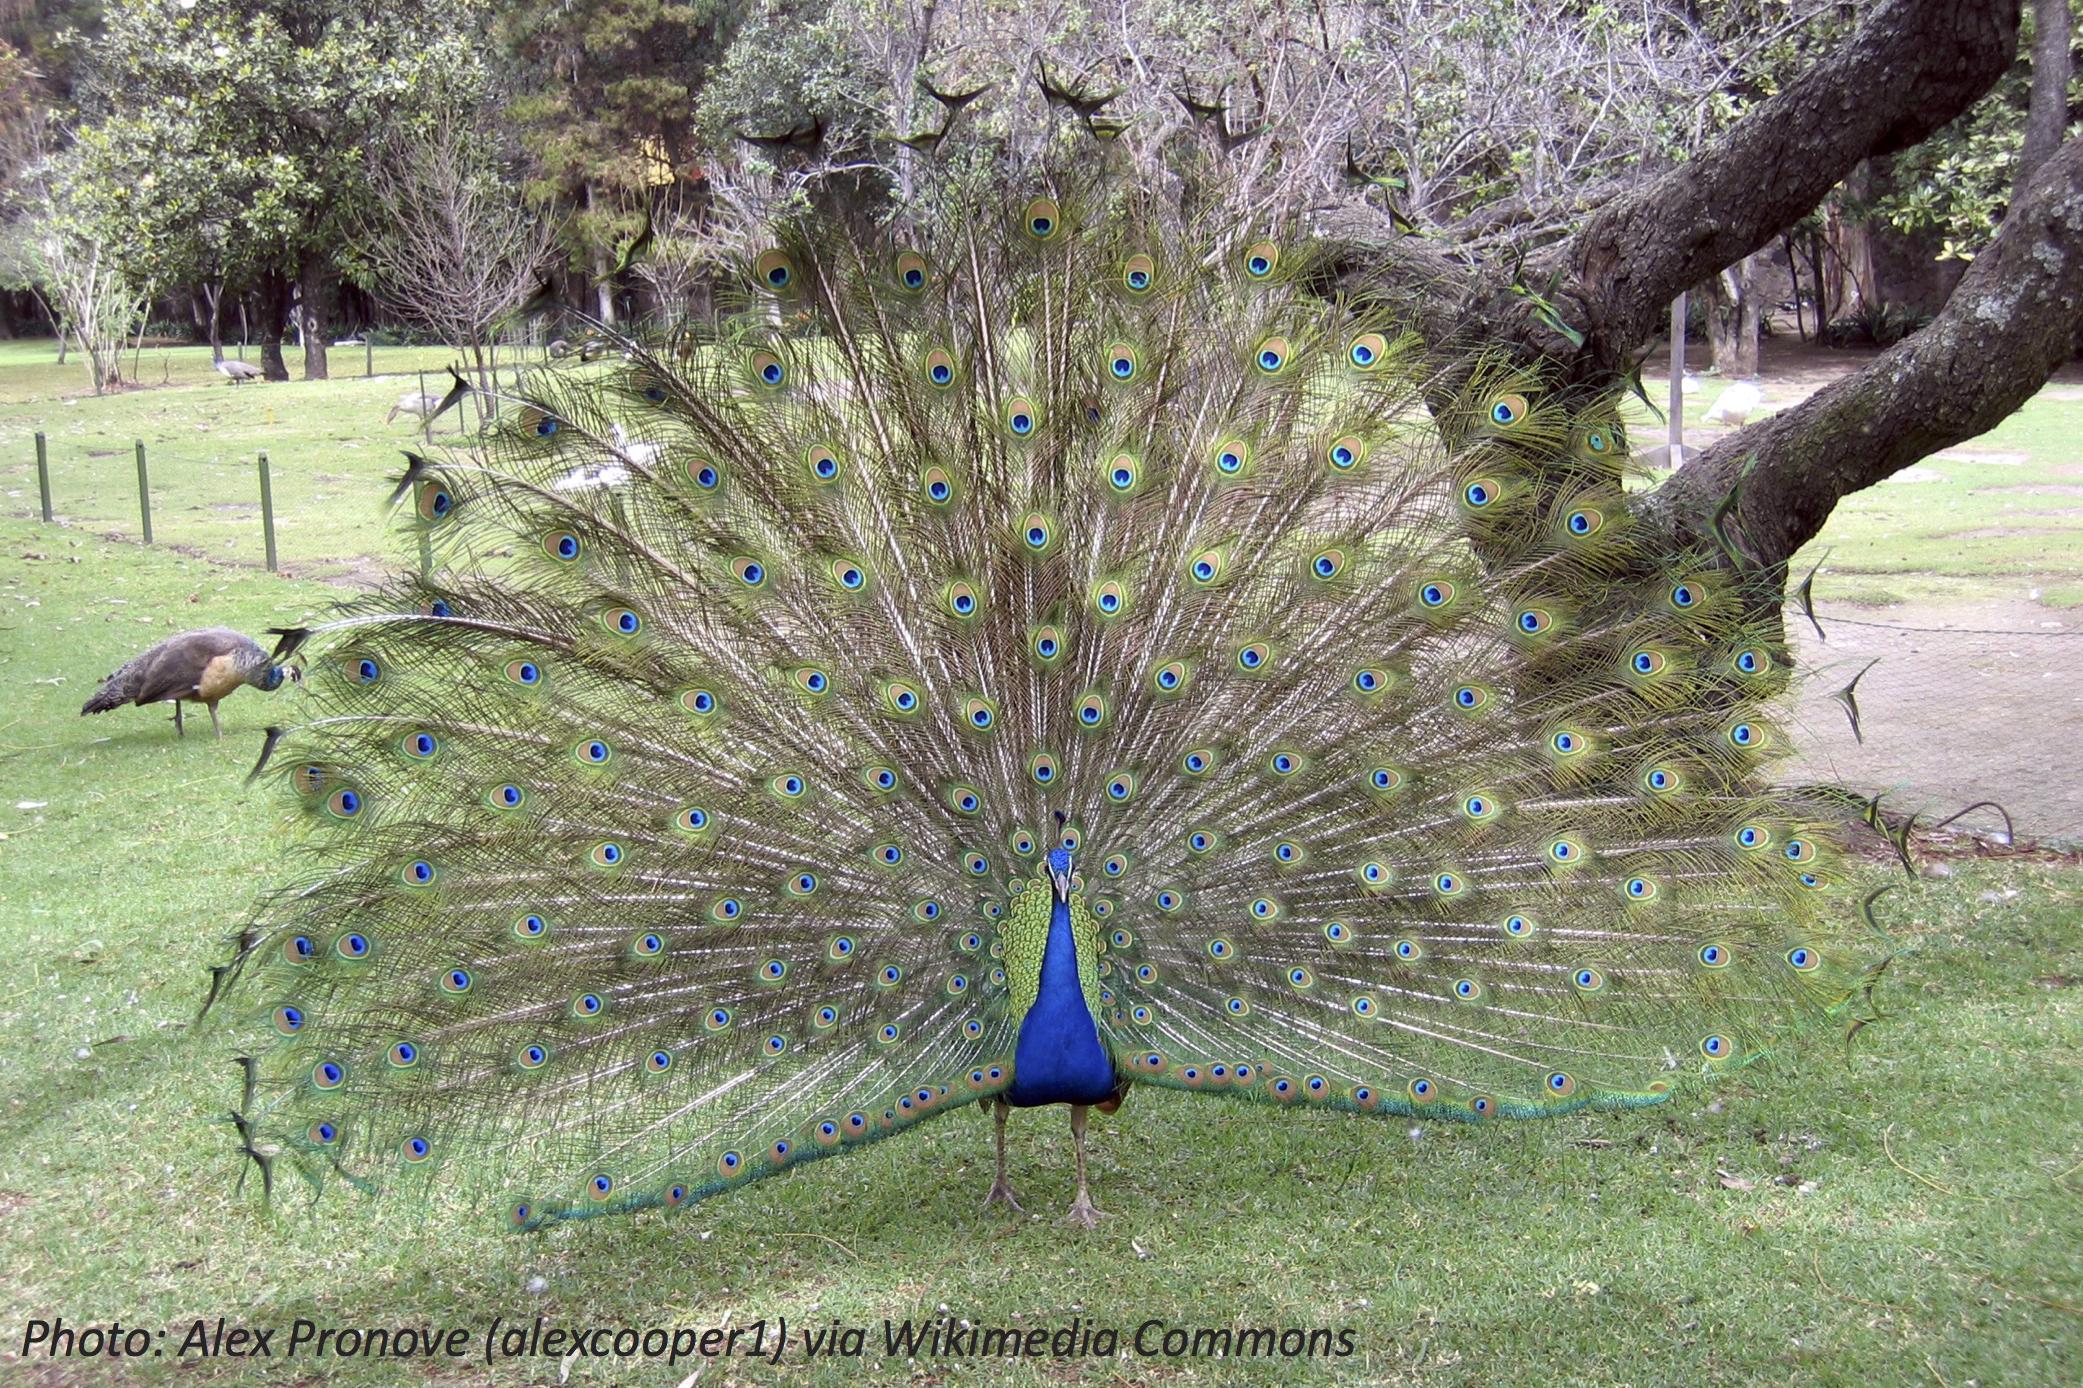 Flash Those Feathers